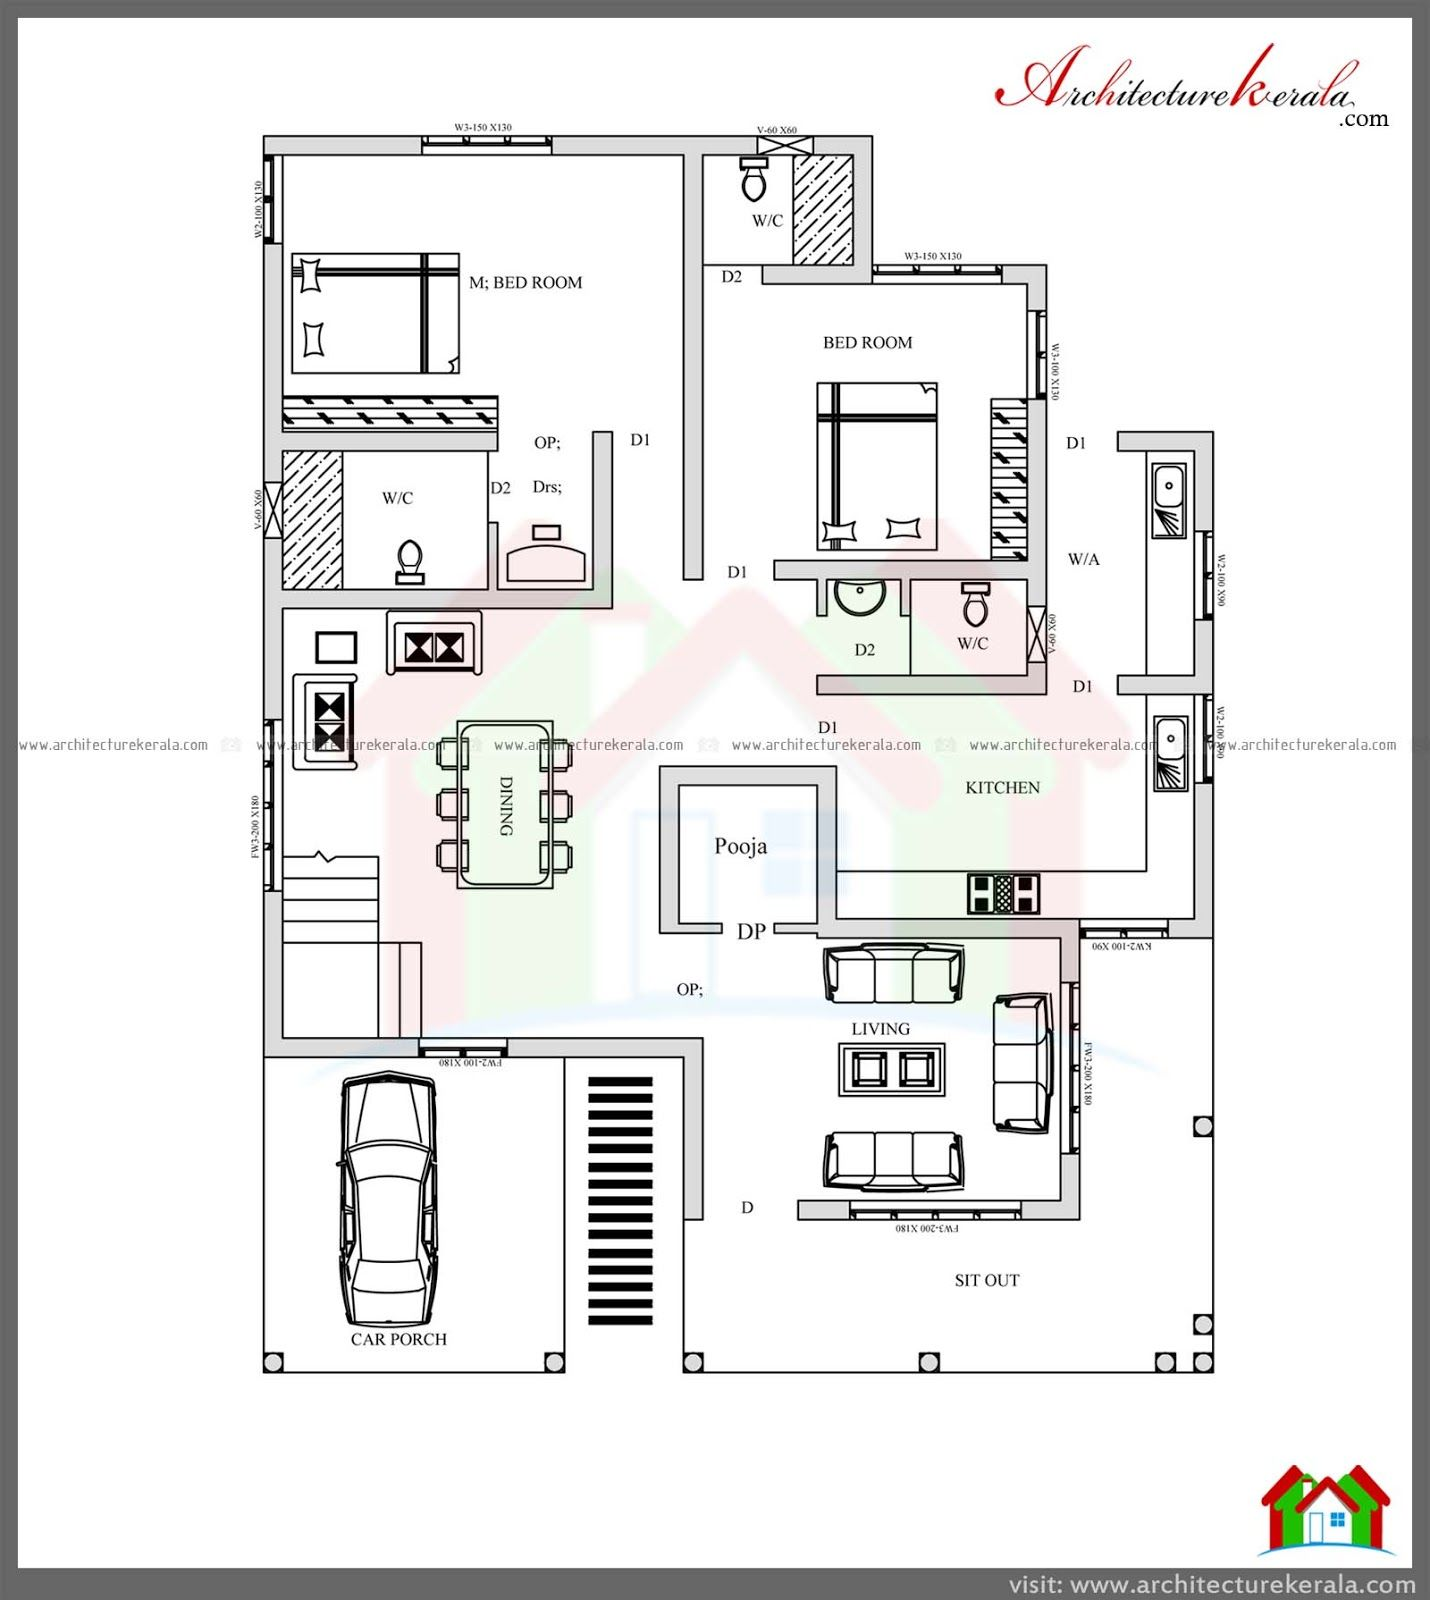 4 bedroom house plans in kerala